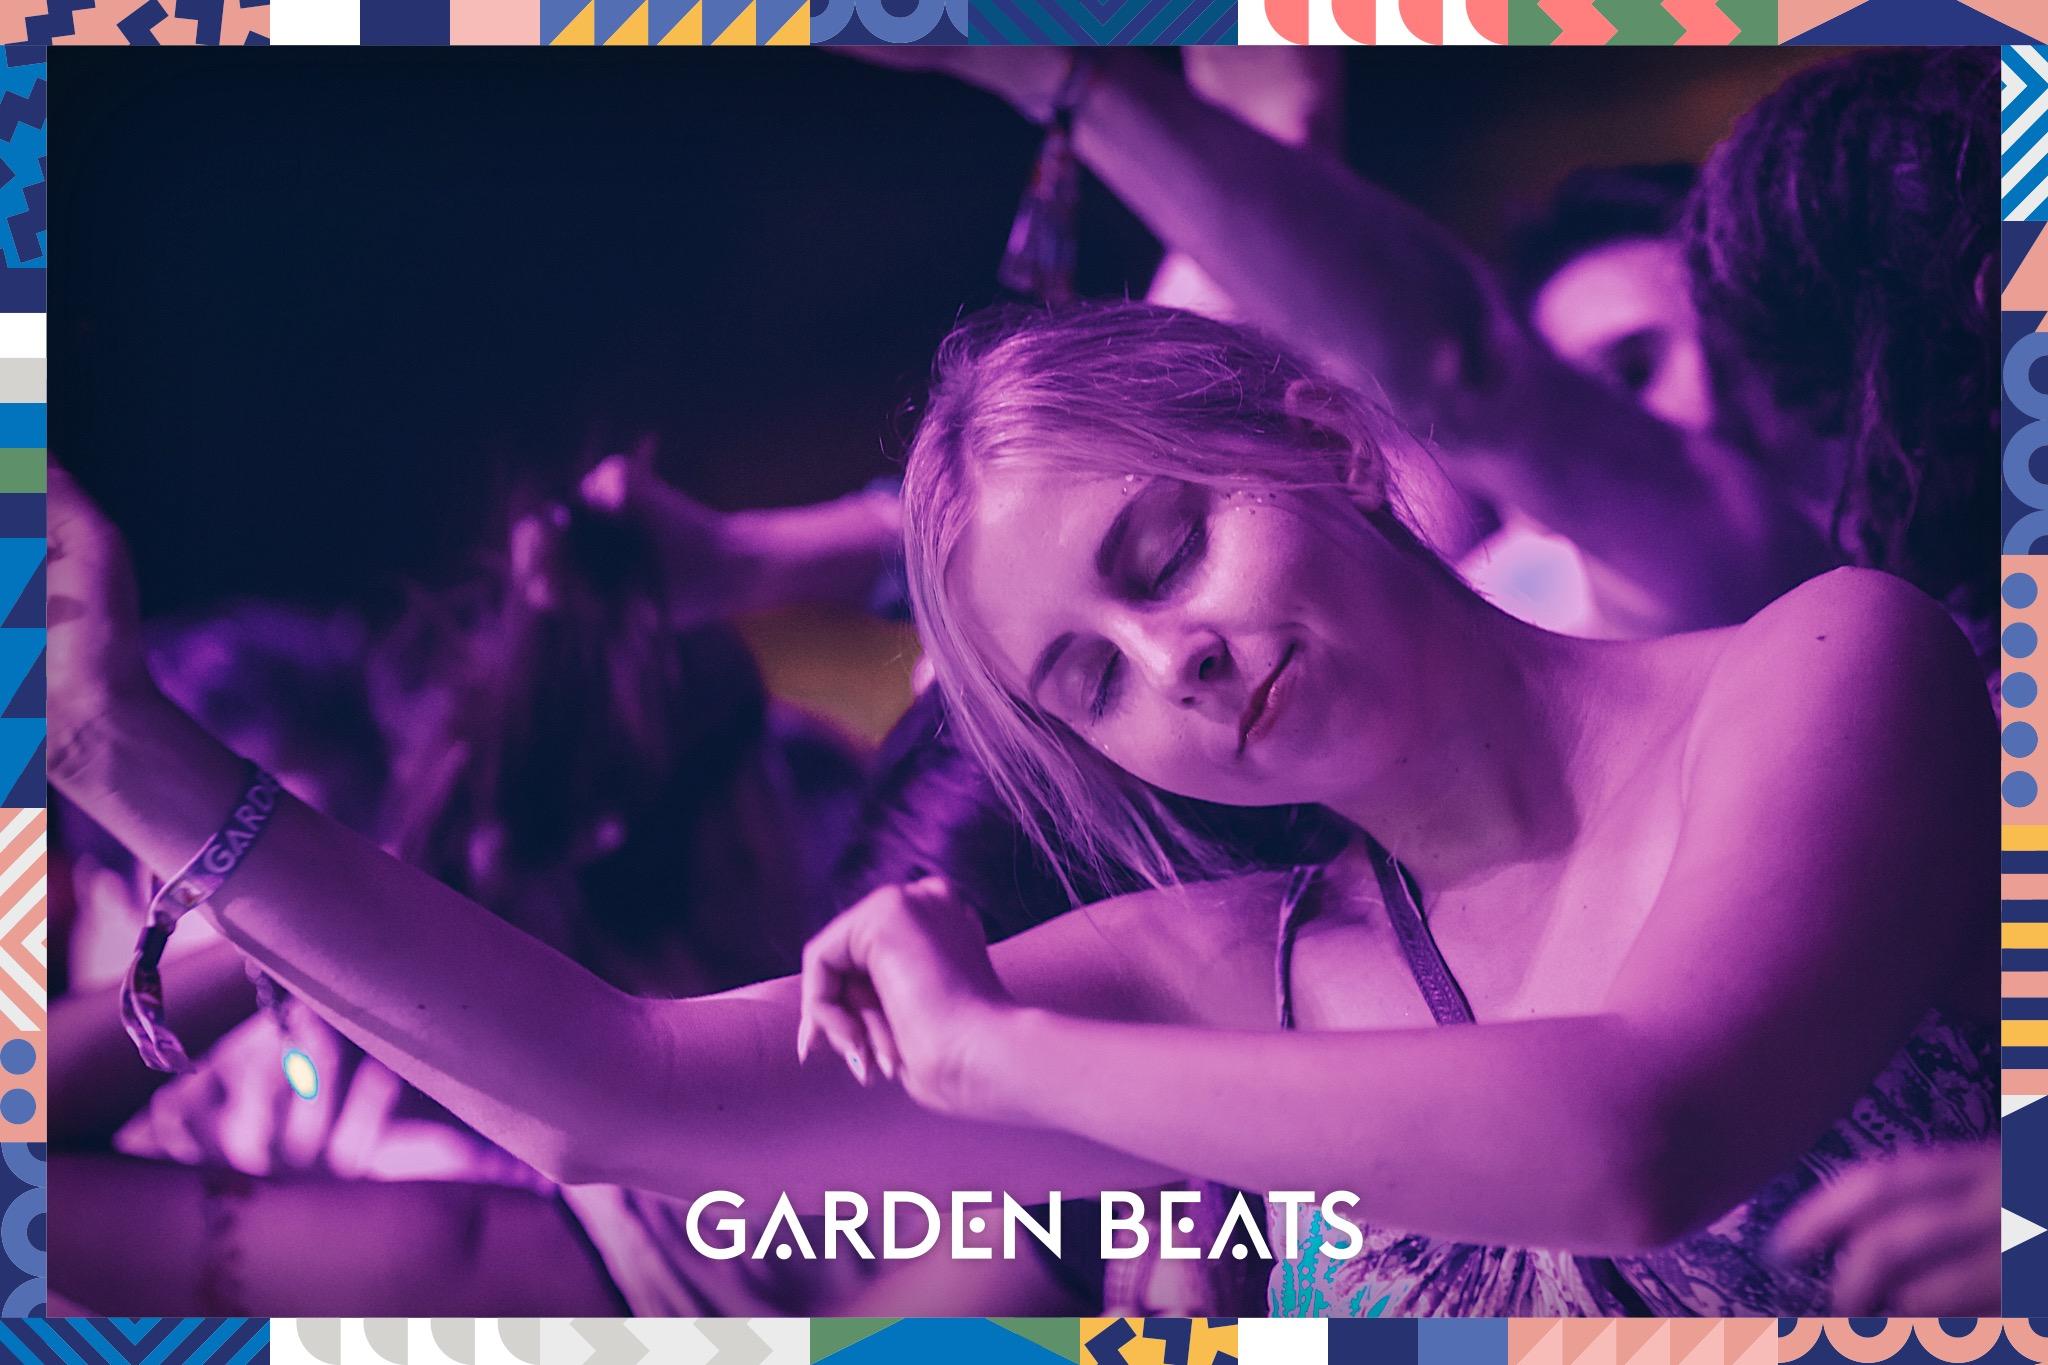 18032017_GardenBeats_Colossal813_WatermarkedGB.jpg